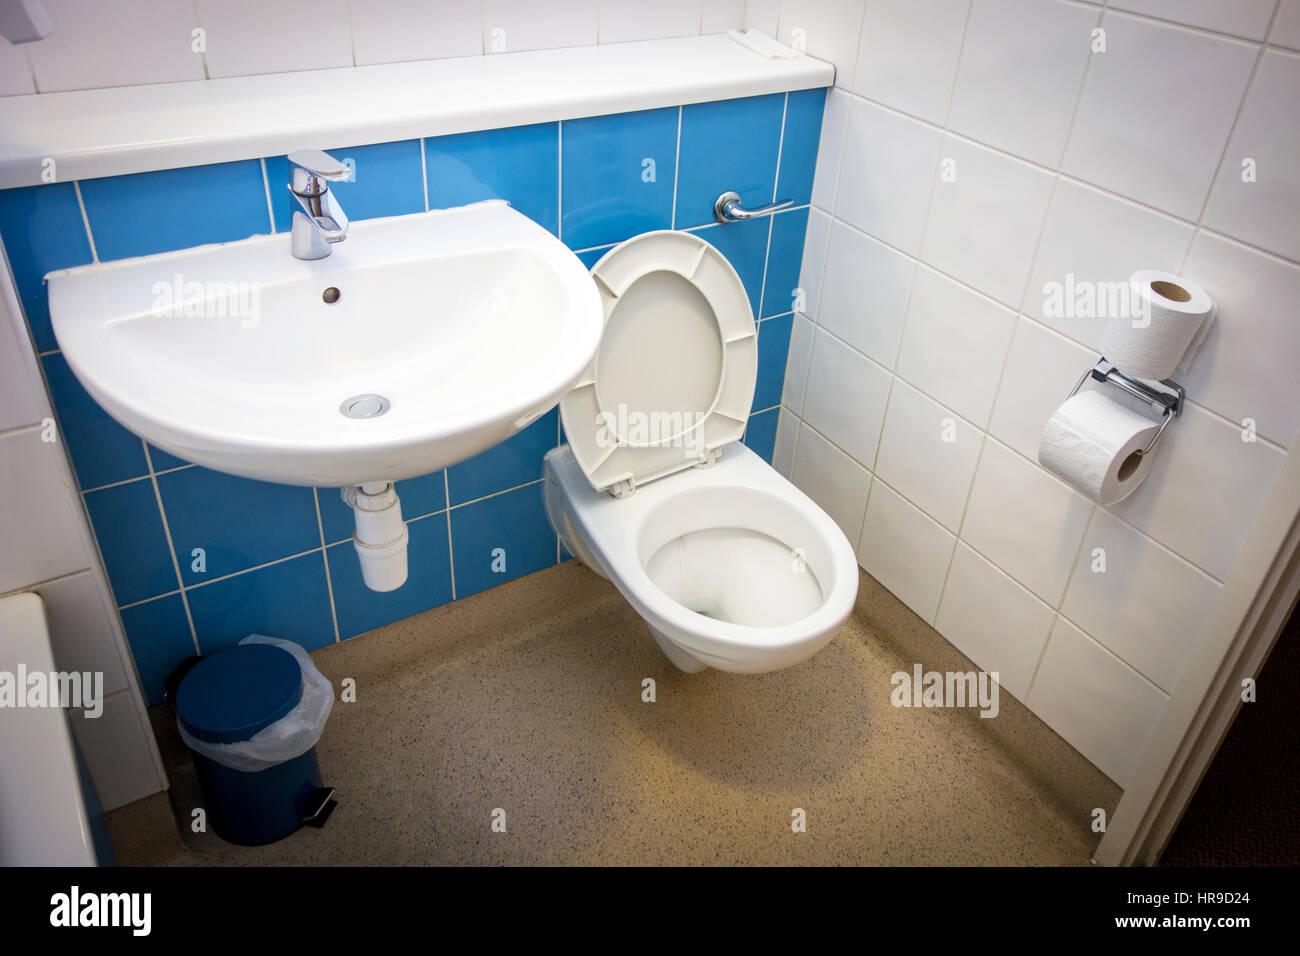 Hotel bathroom - Stock Image